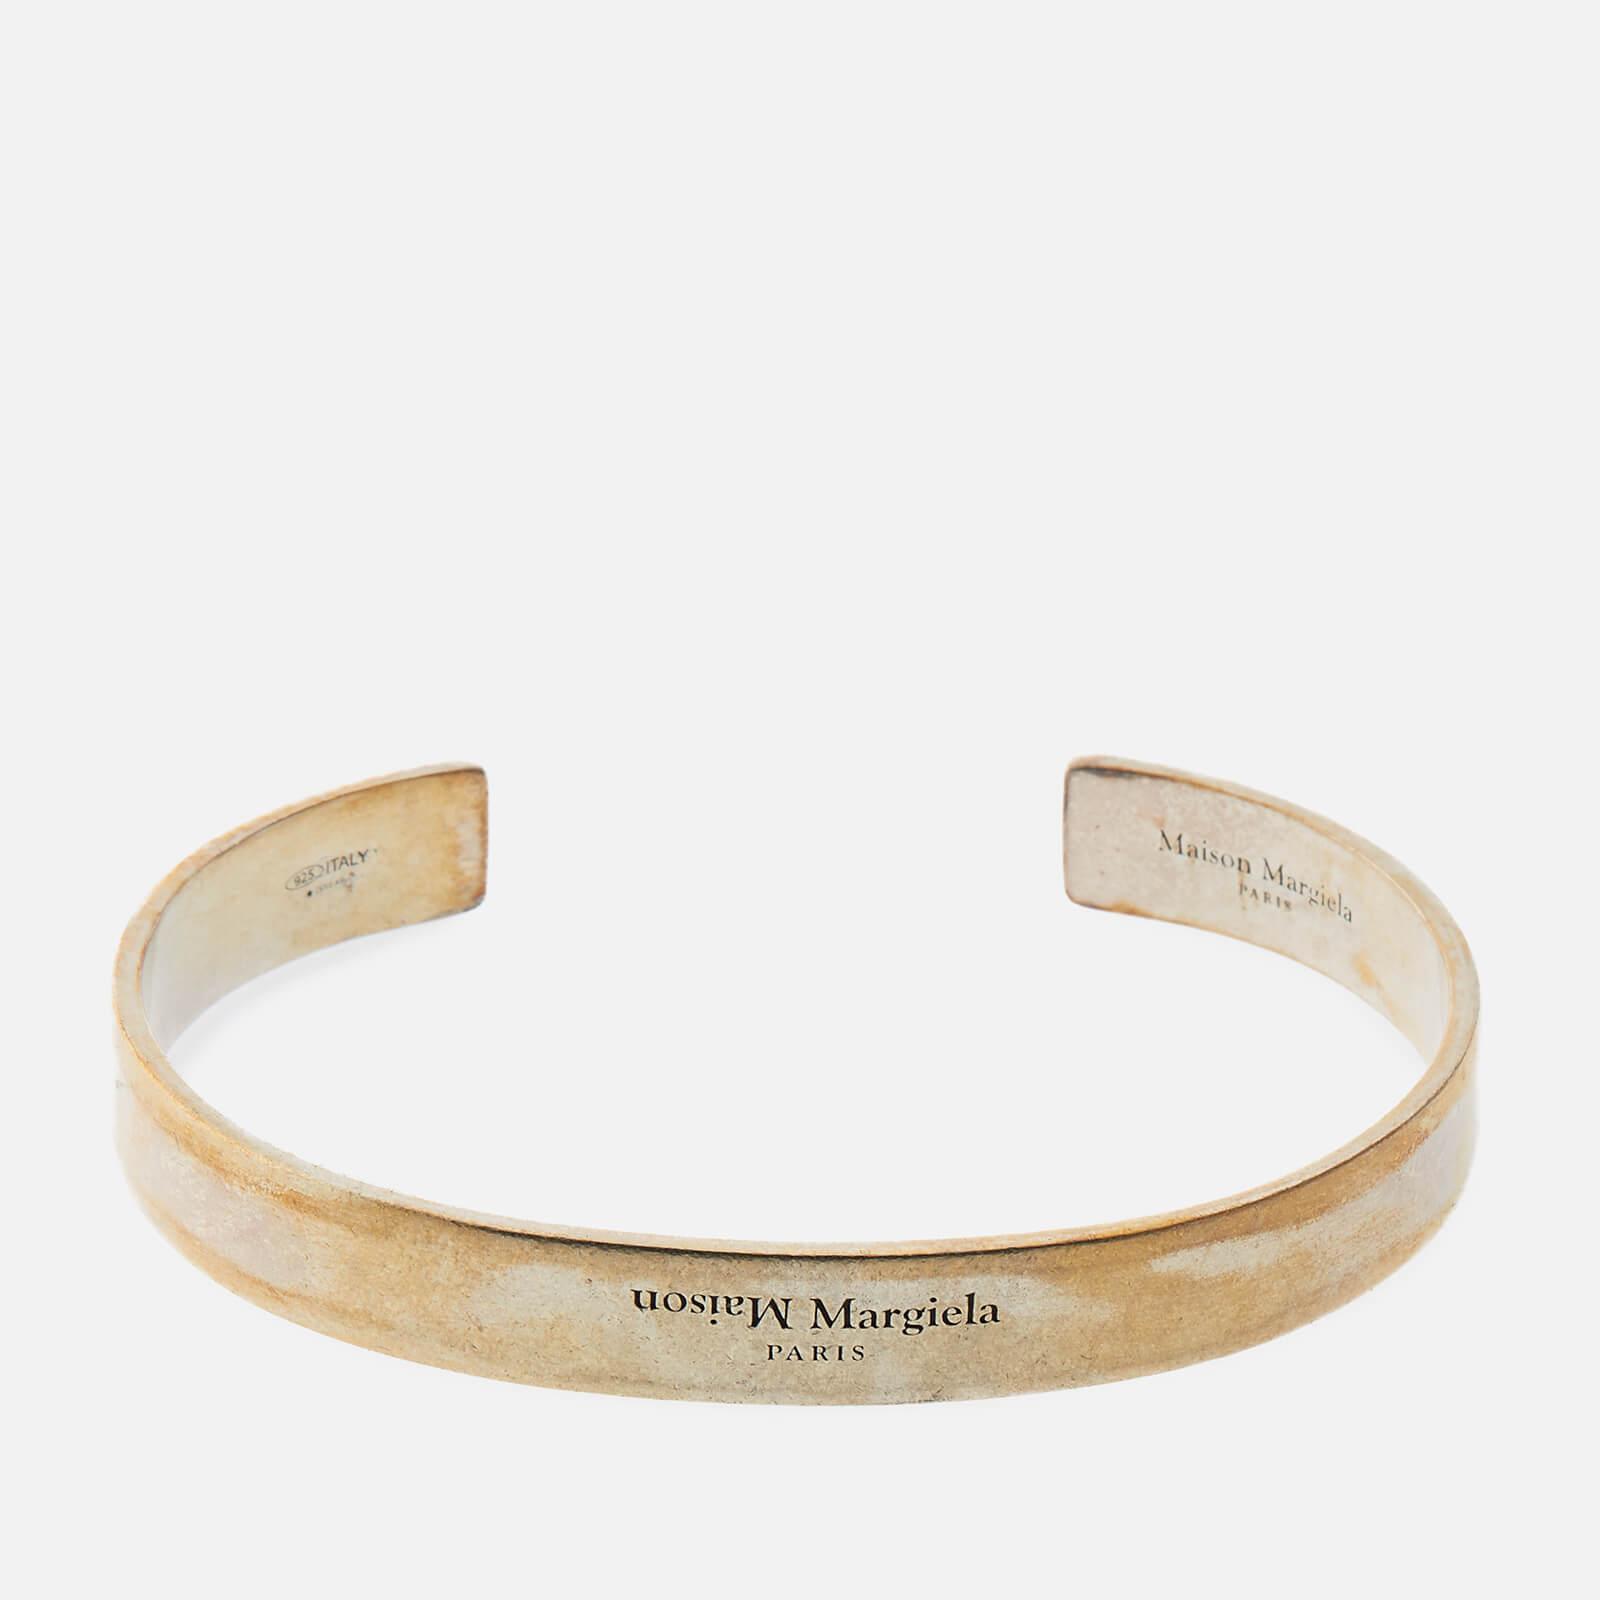 Maison Margiela Men's Bracelet - Brunito - M